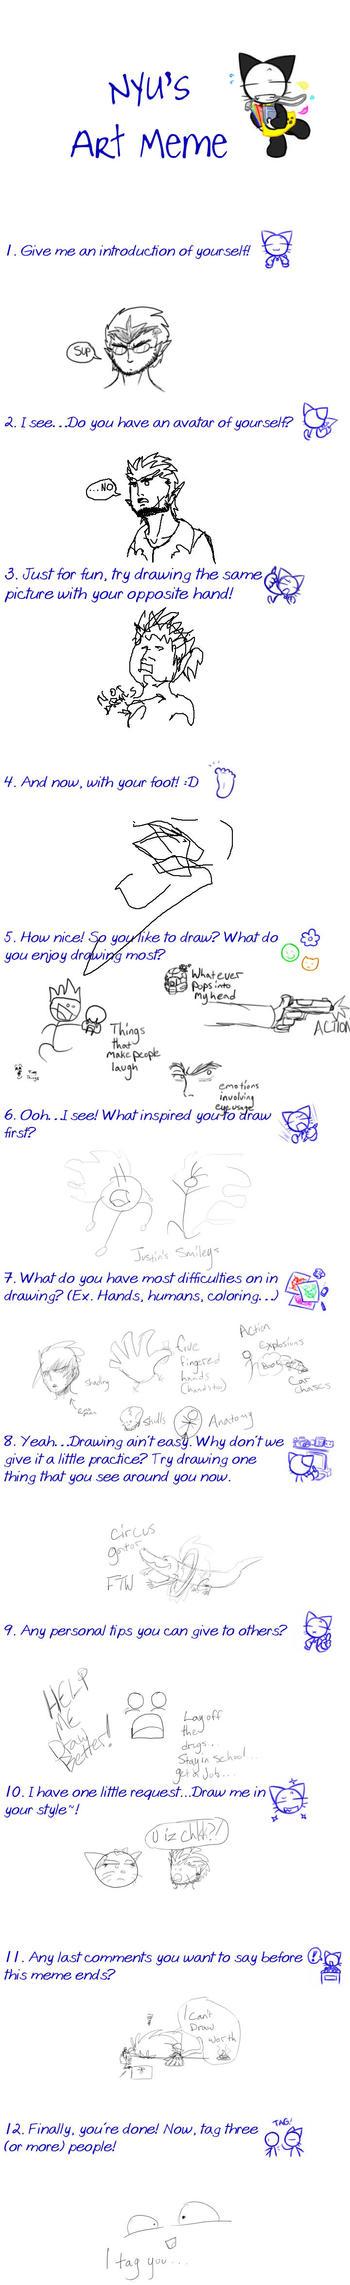 Art meme thing by ChristianL337